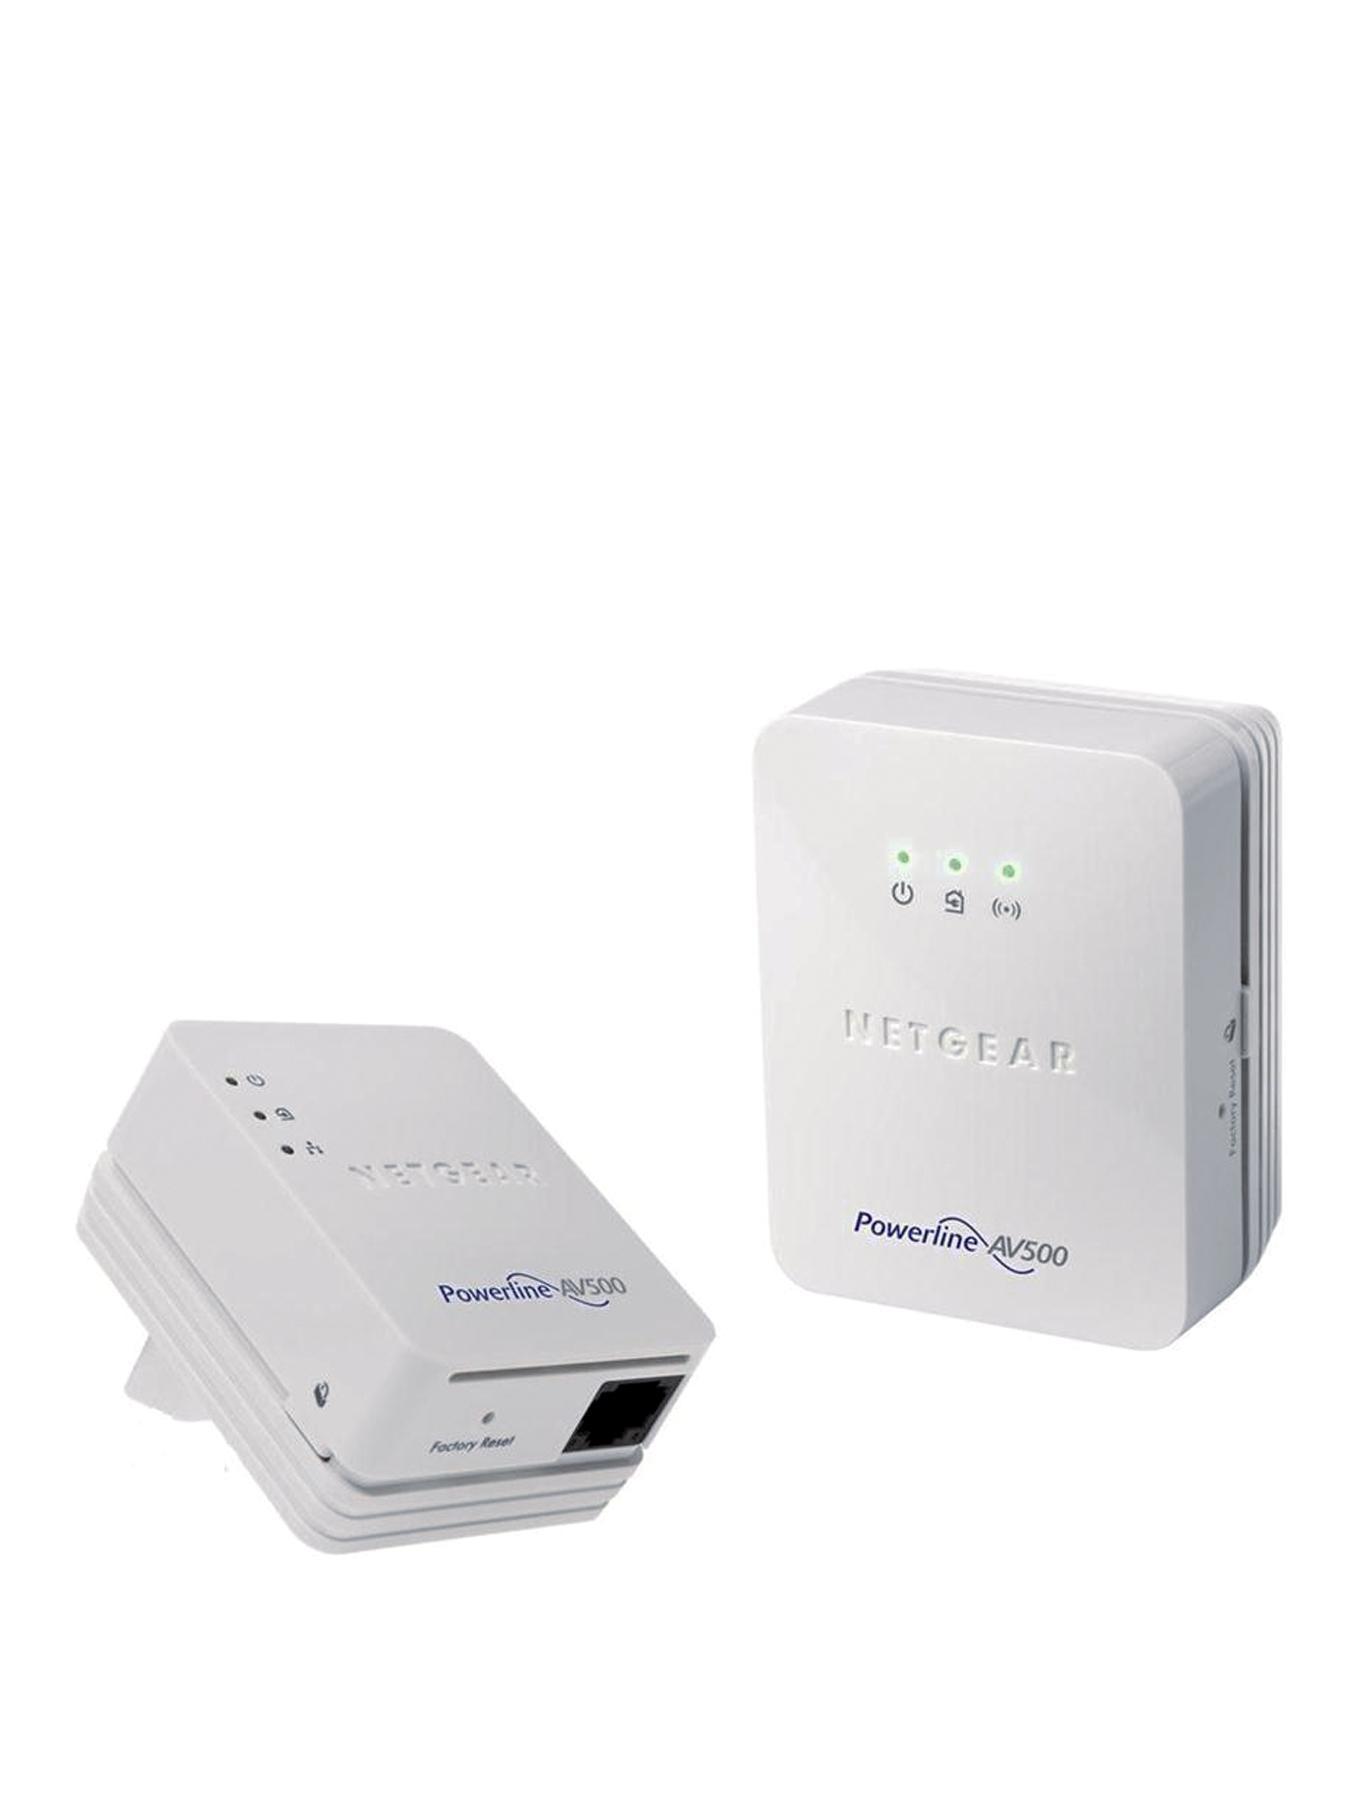 Netgear NETXWNB5201 Powerline 500Mbps WiFi Extender/Access Point